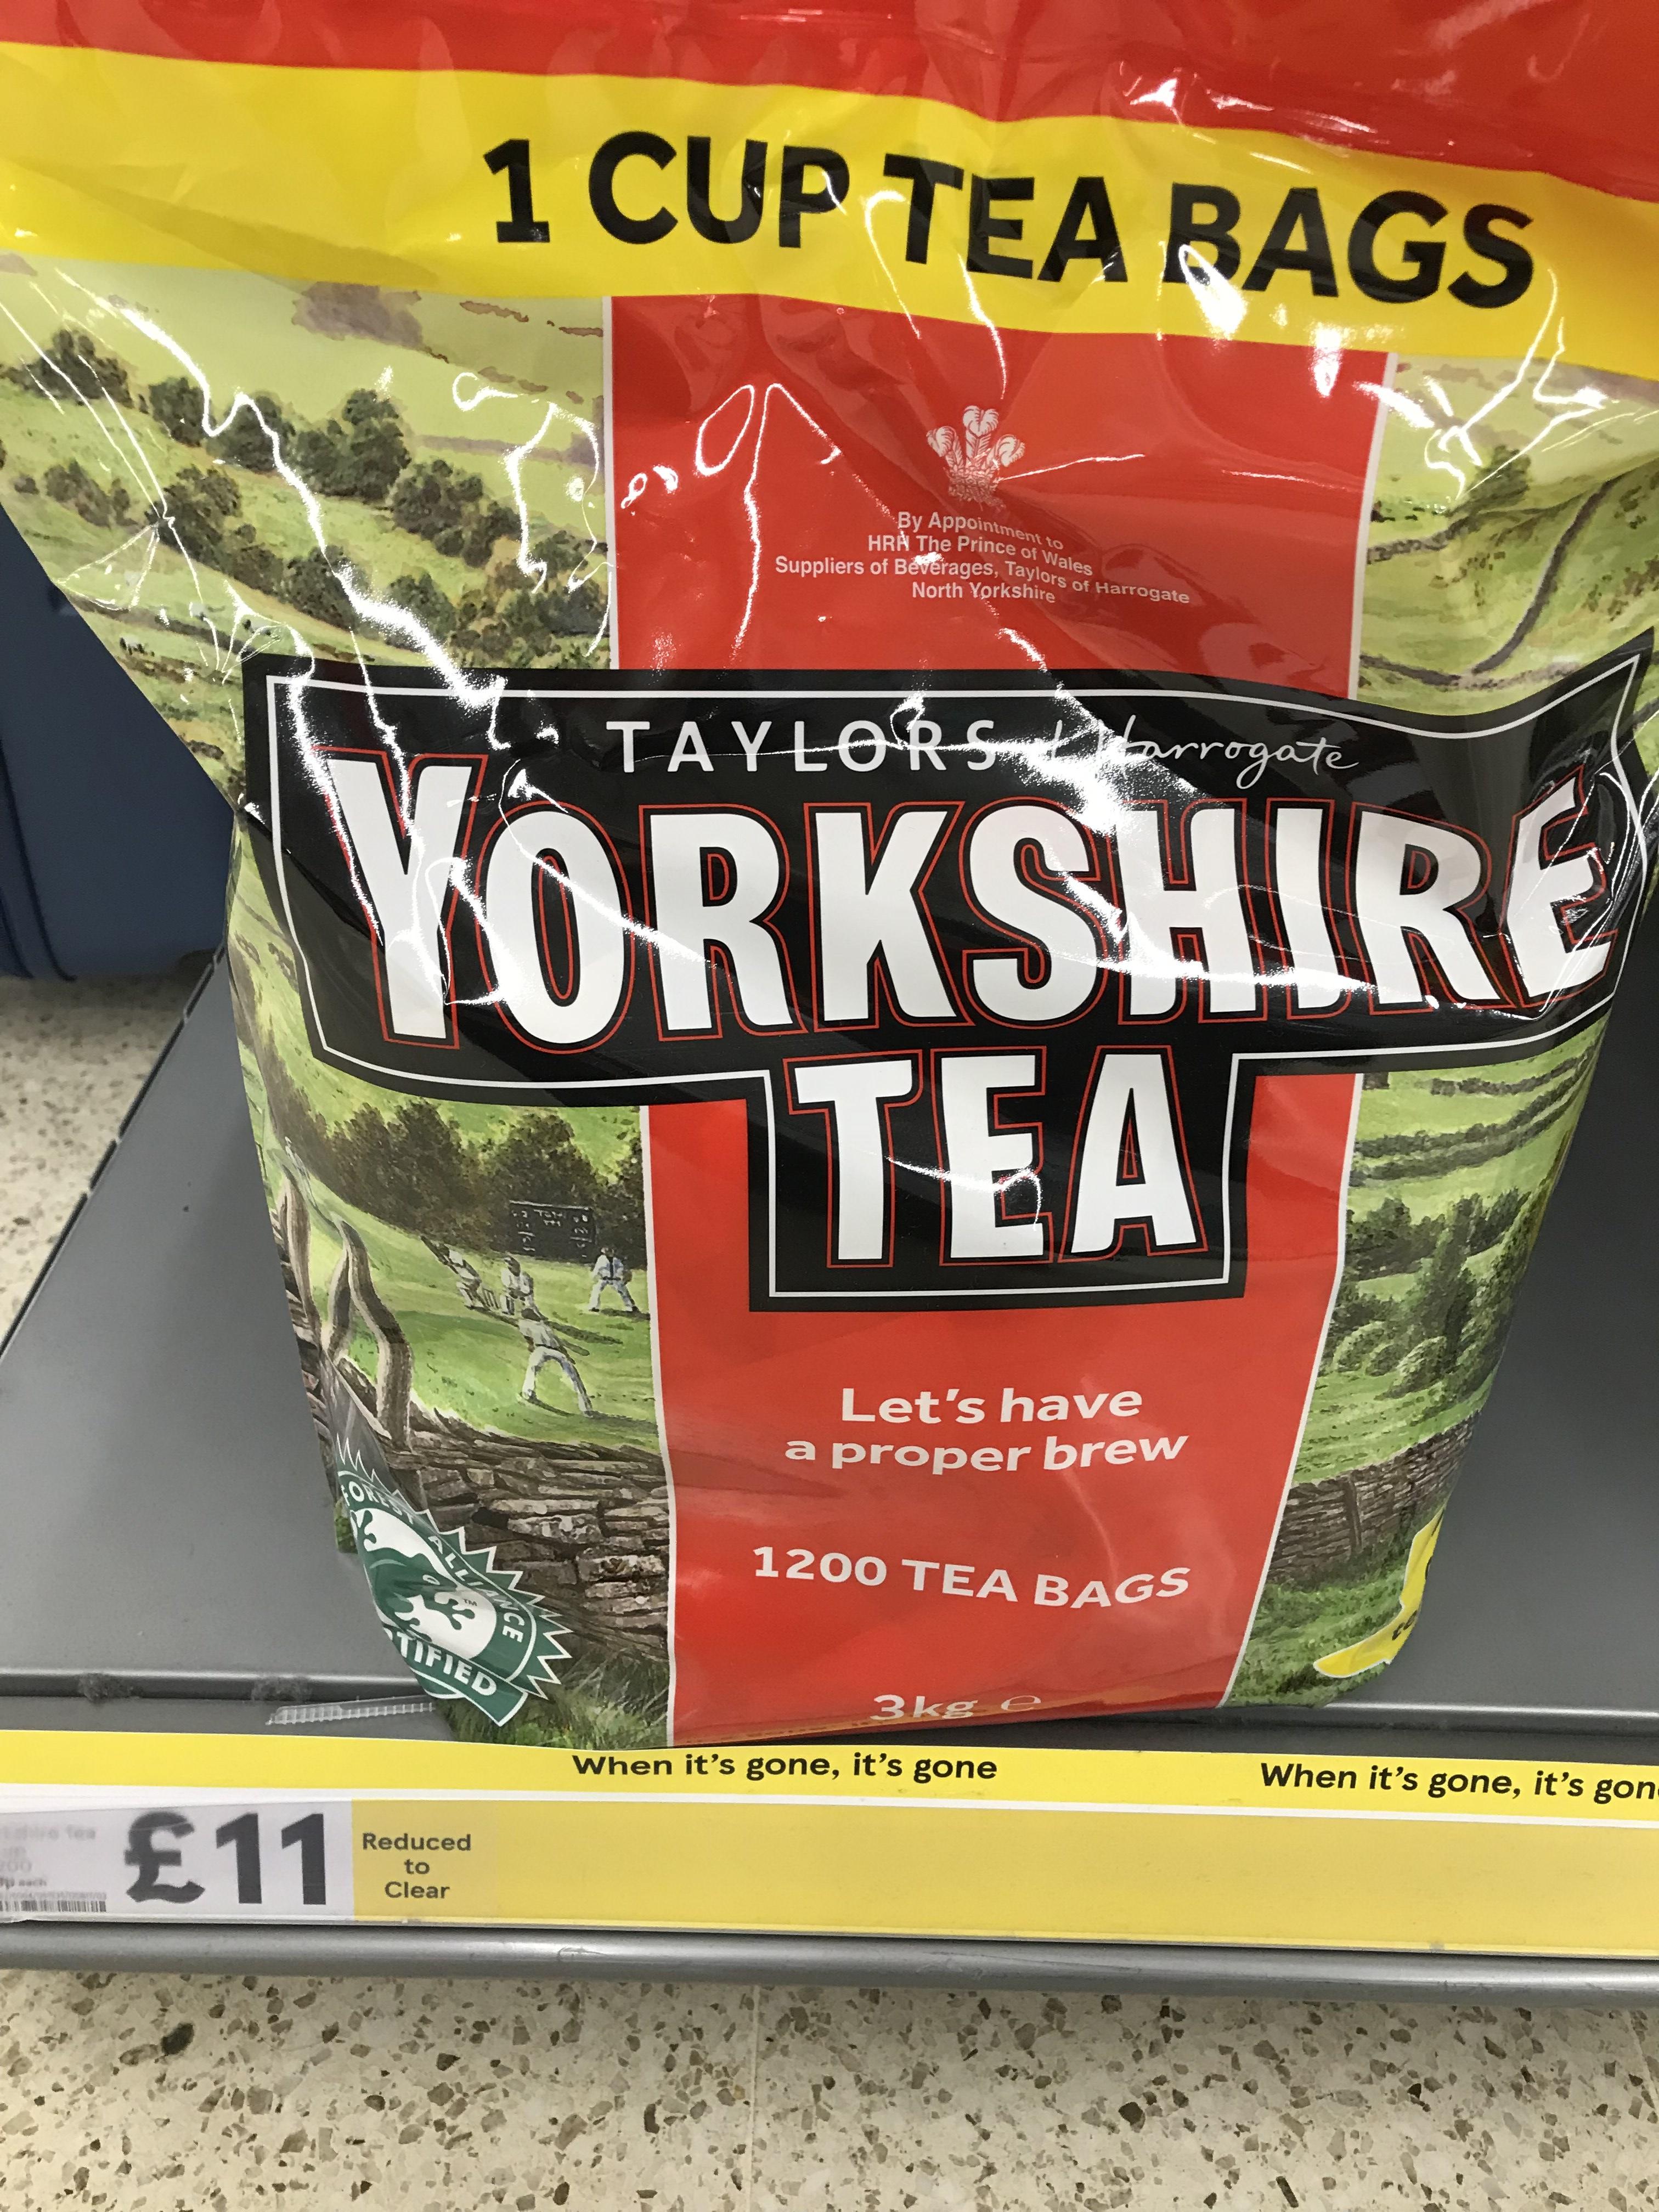 Yorkshire Tea One Cup 3kg (1200 Tea Bags) £11 rtc @ Tesco St Rollox